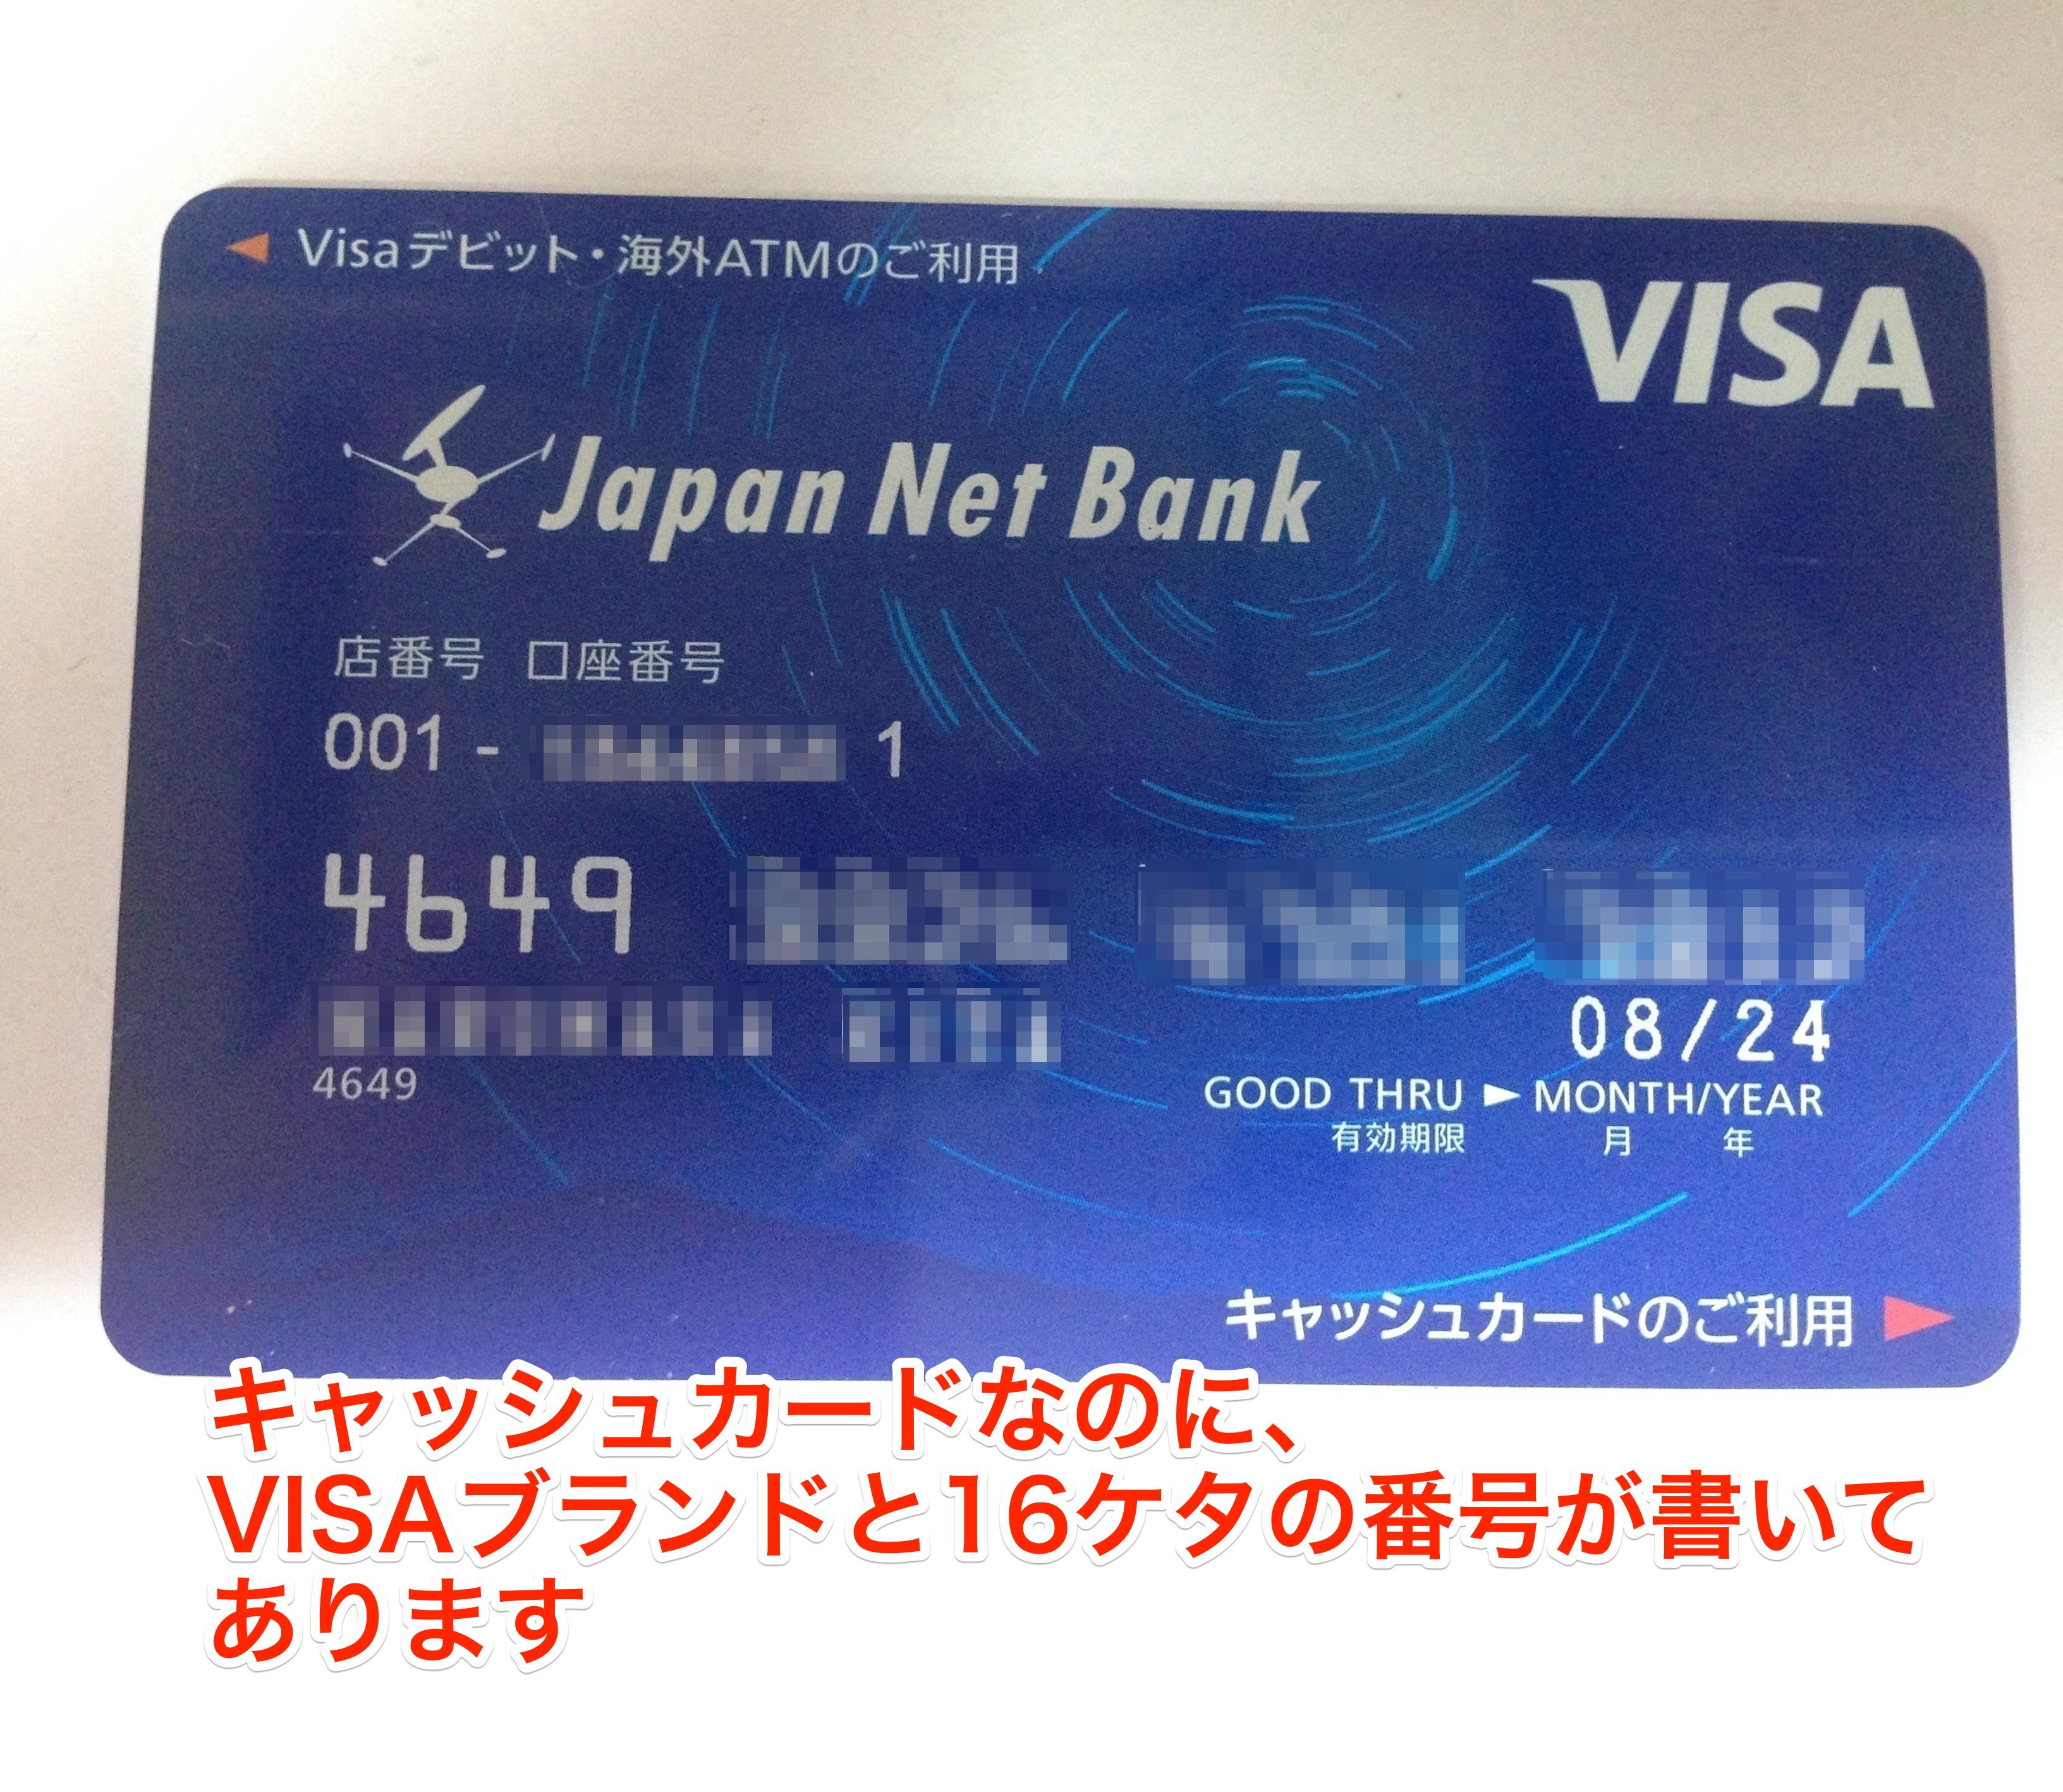 JNB_VISAデビットカード